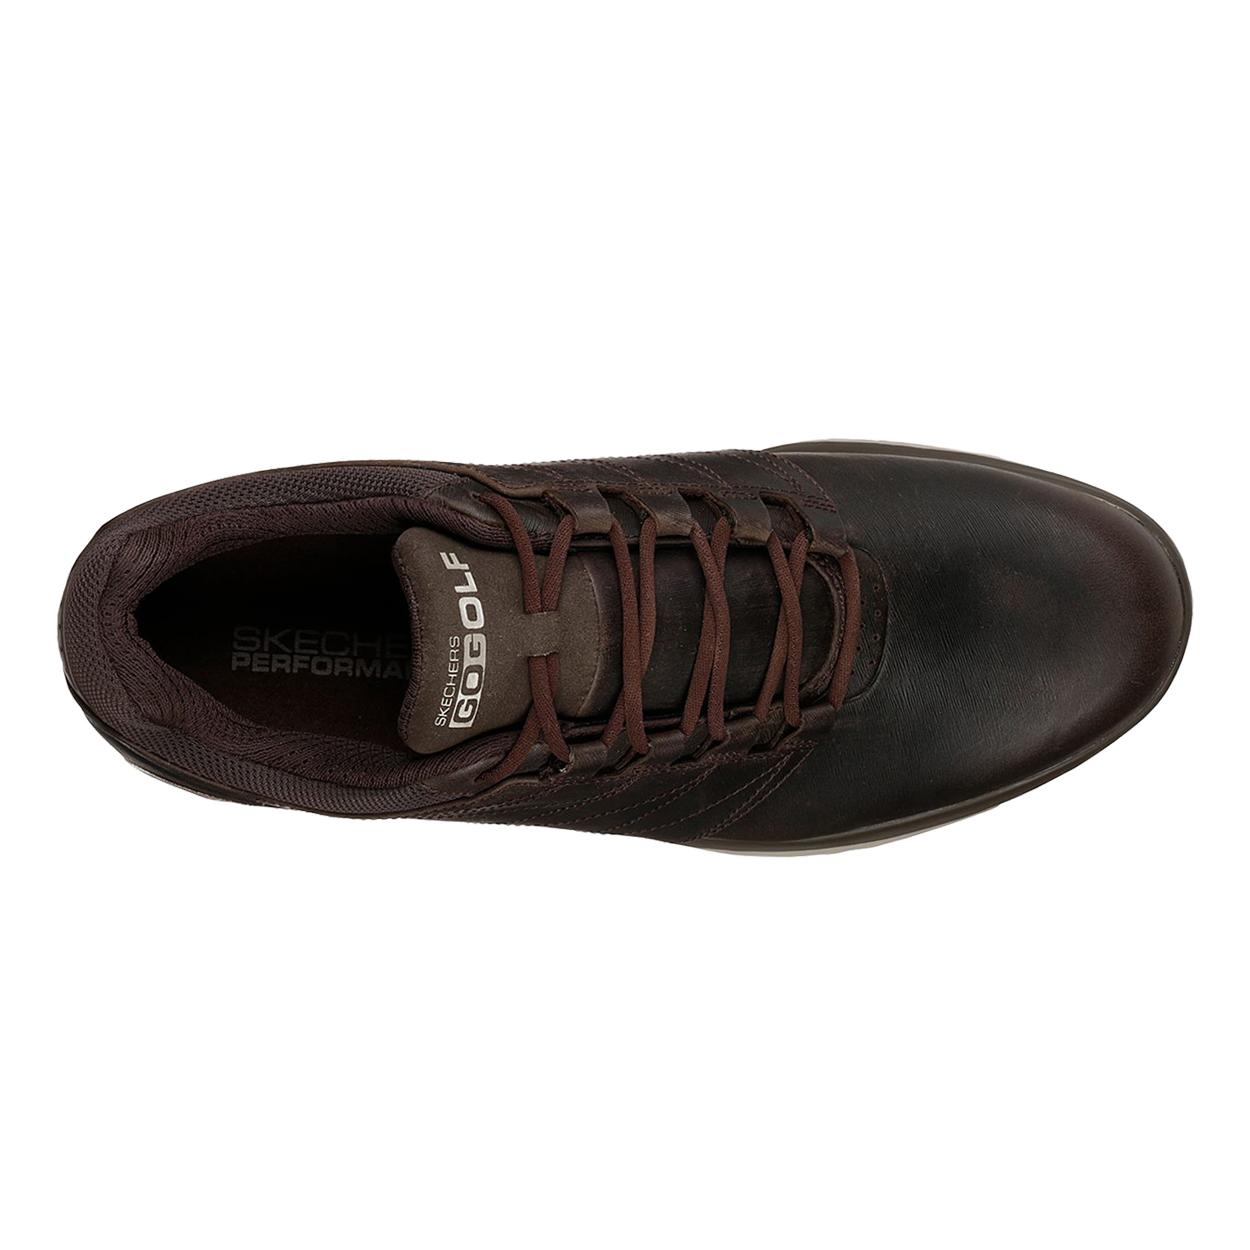 Skechers-Men-039-s-GOgolf-Pro-4-LX-Leather-Golf-Shoe-Brand-New thumbnail 13